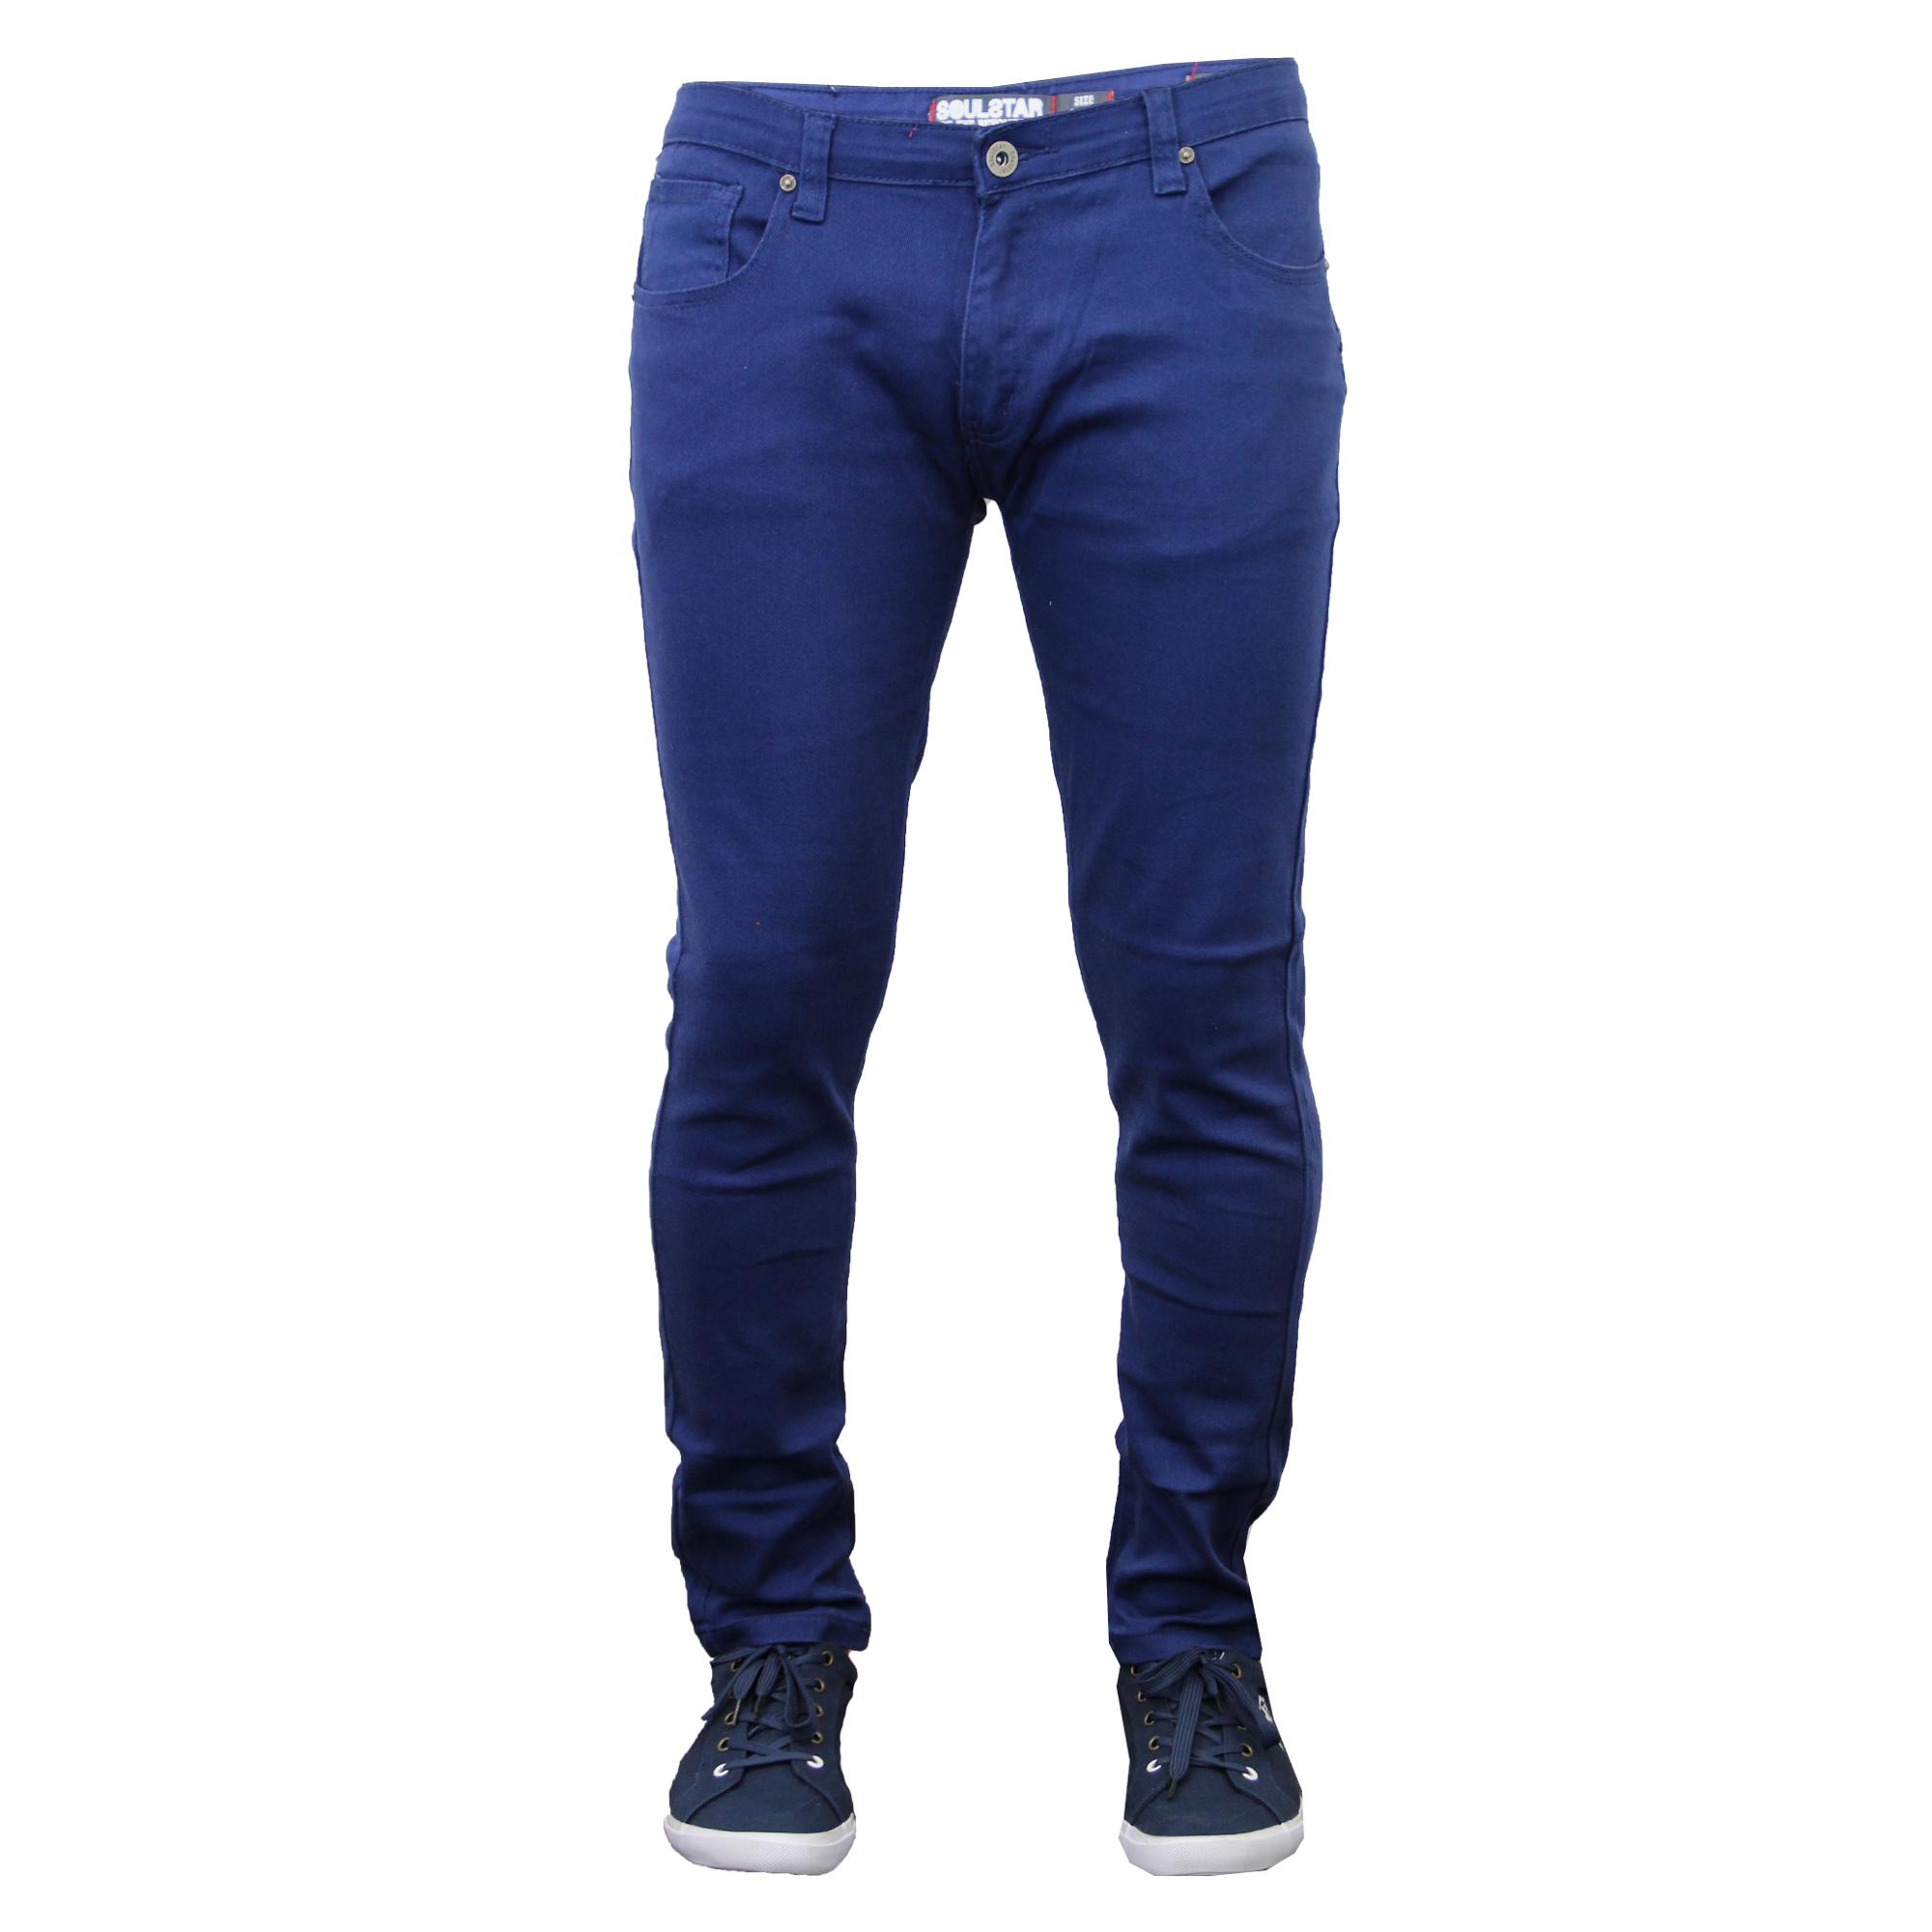 Mens Jeans Size 26 X 32